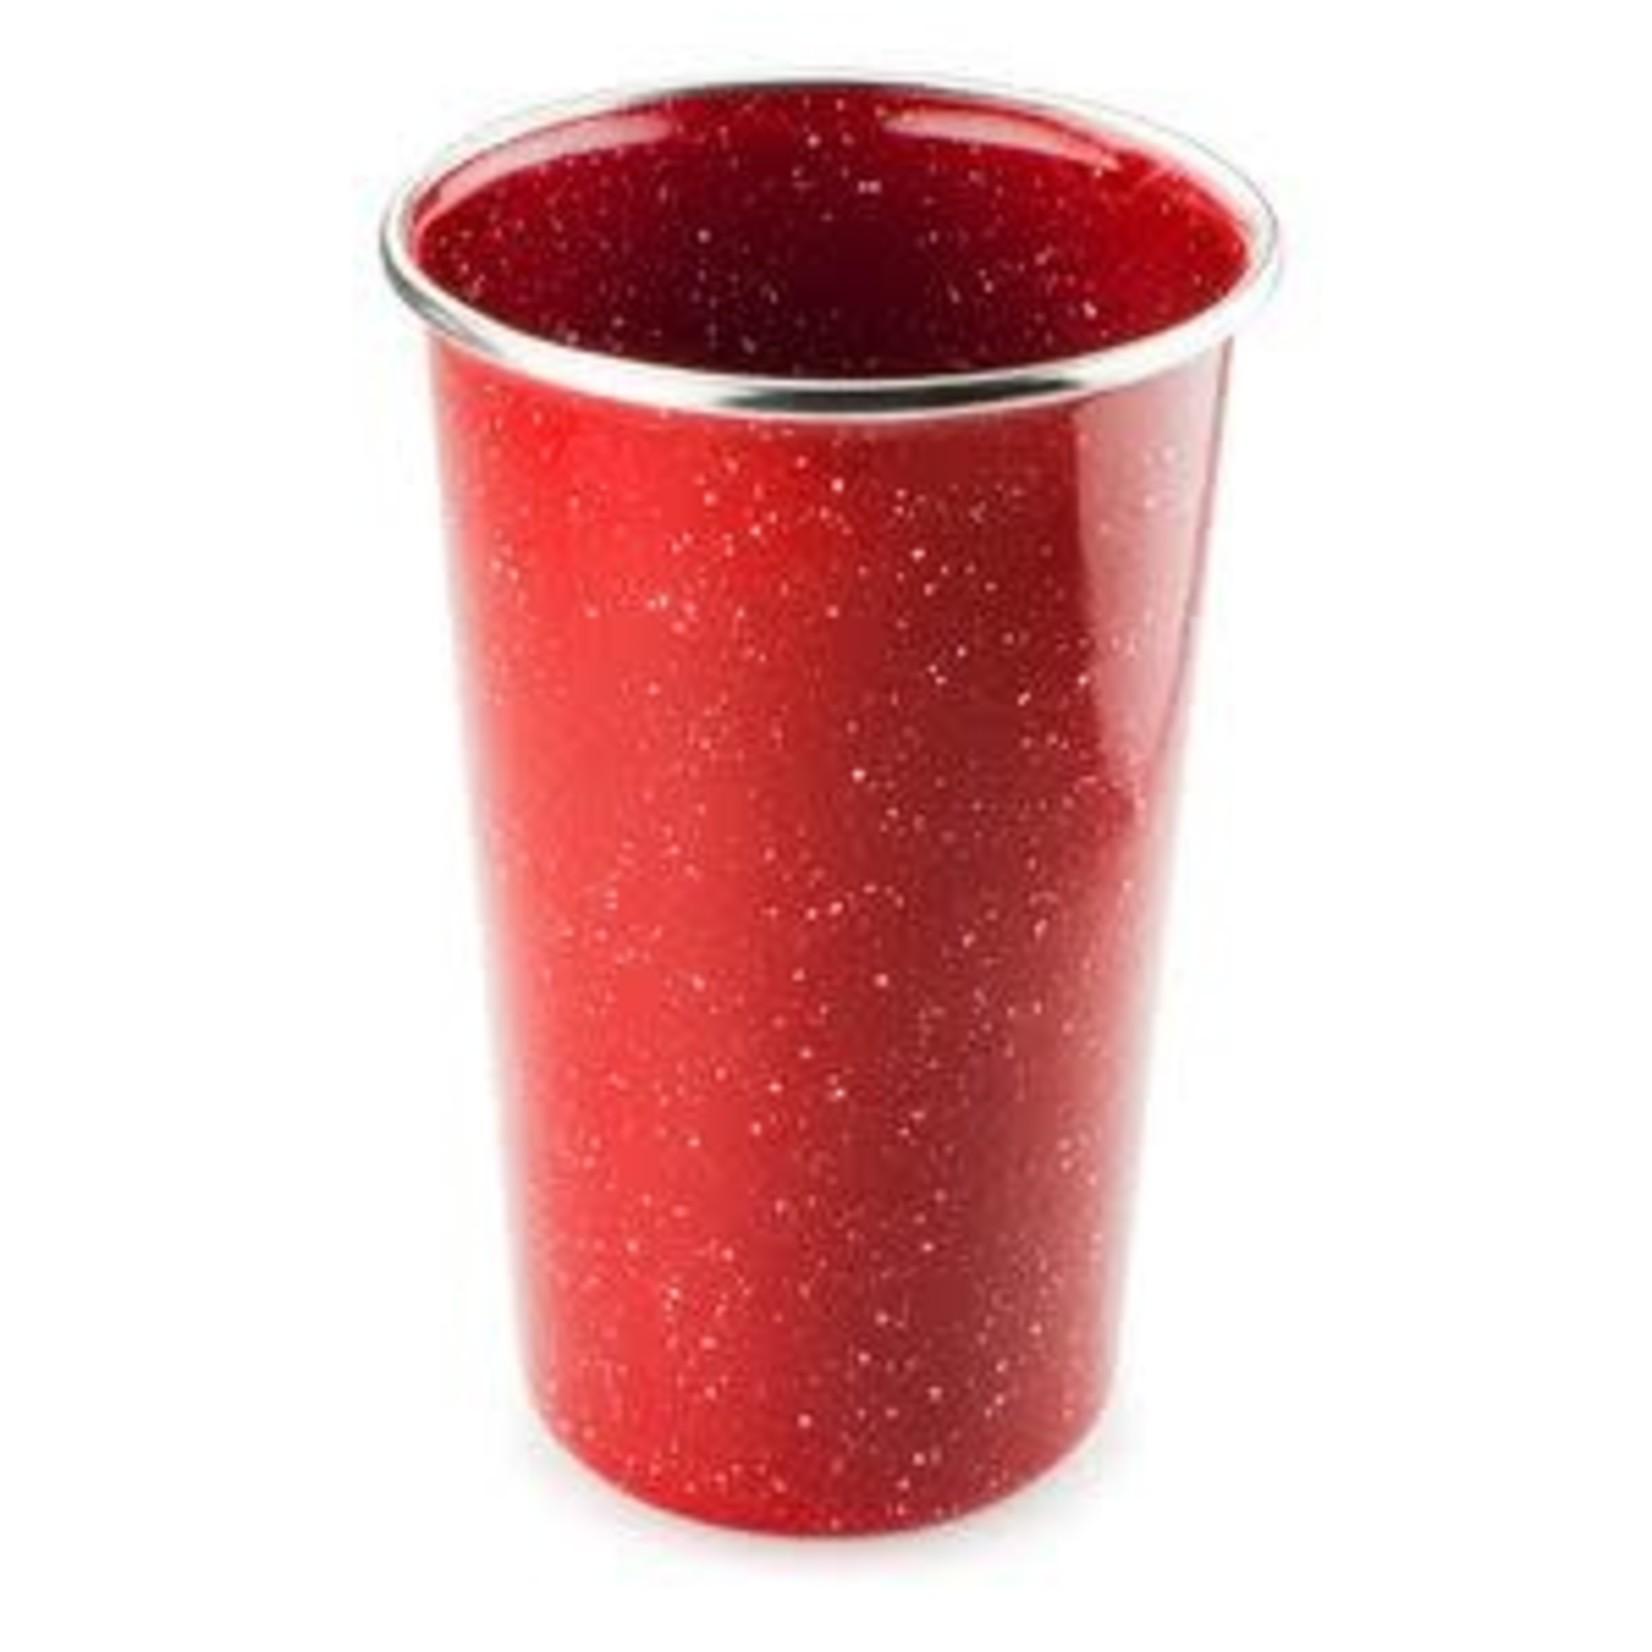 GSI GSI Pioneer Red Enamel Pint Mug